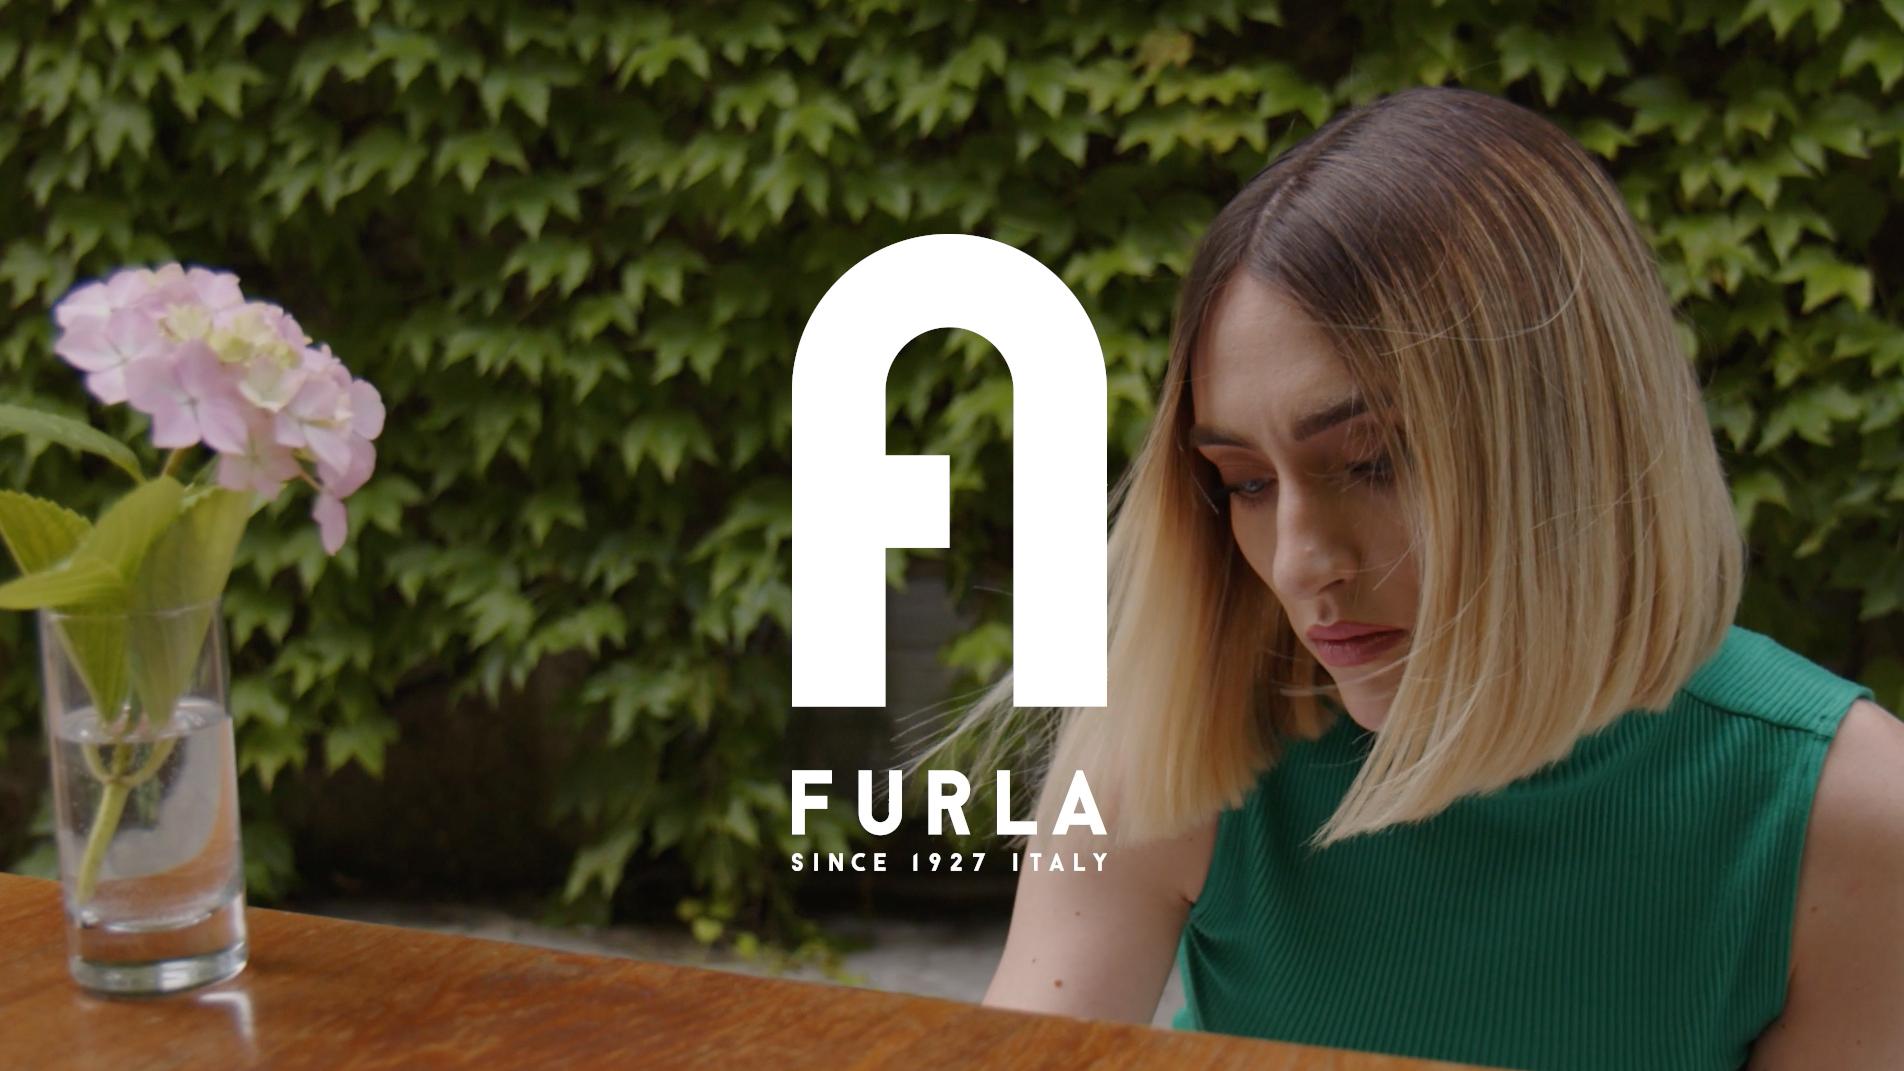 FURLA INTERVIEWS: MARA SATTEI